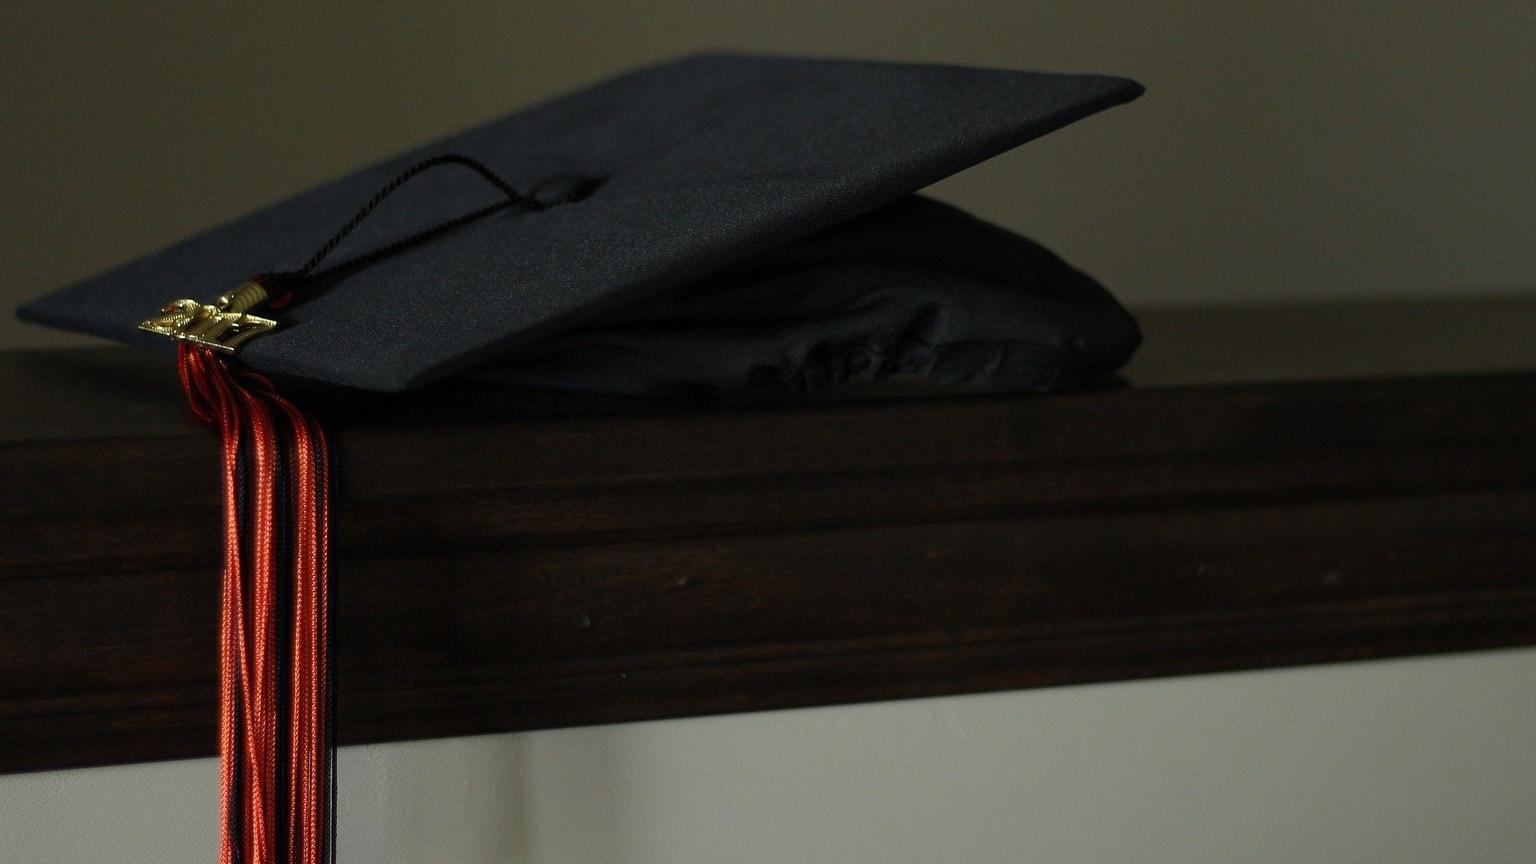 Harvard-Bound High School Grad Turns Down $40K Scholarship, Asks That It Go To Community College Student